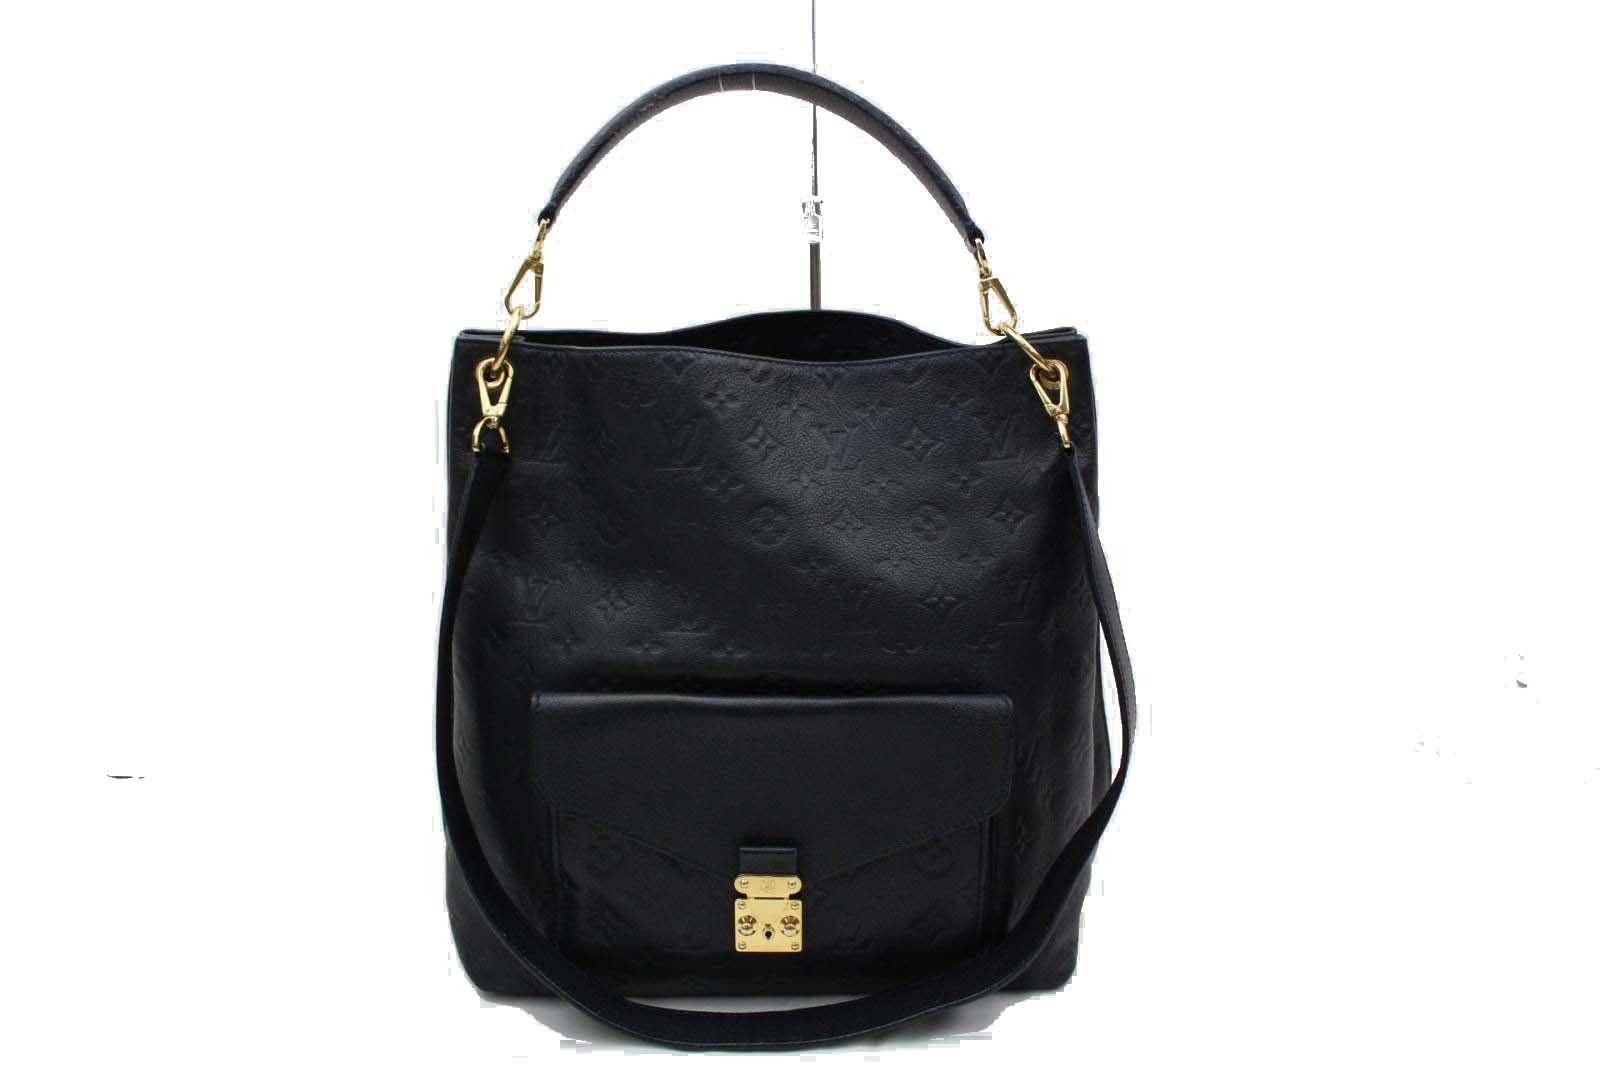 66fc8467cd Louis Vuitton Metis M40810 Monogram Empreinte Shoulder Bag ...